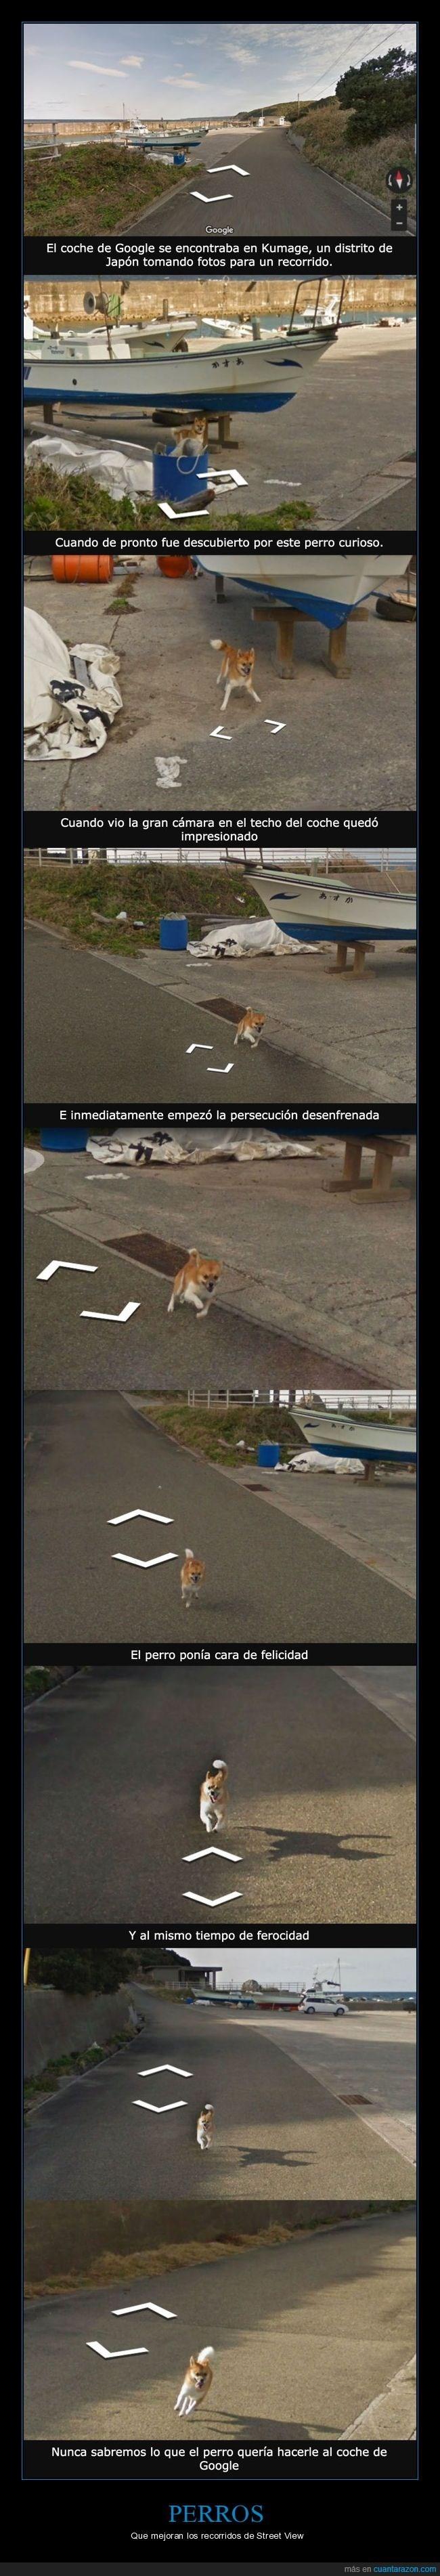 un perro persigue un carro de google